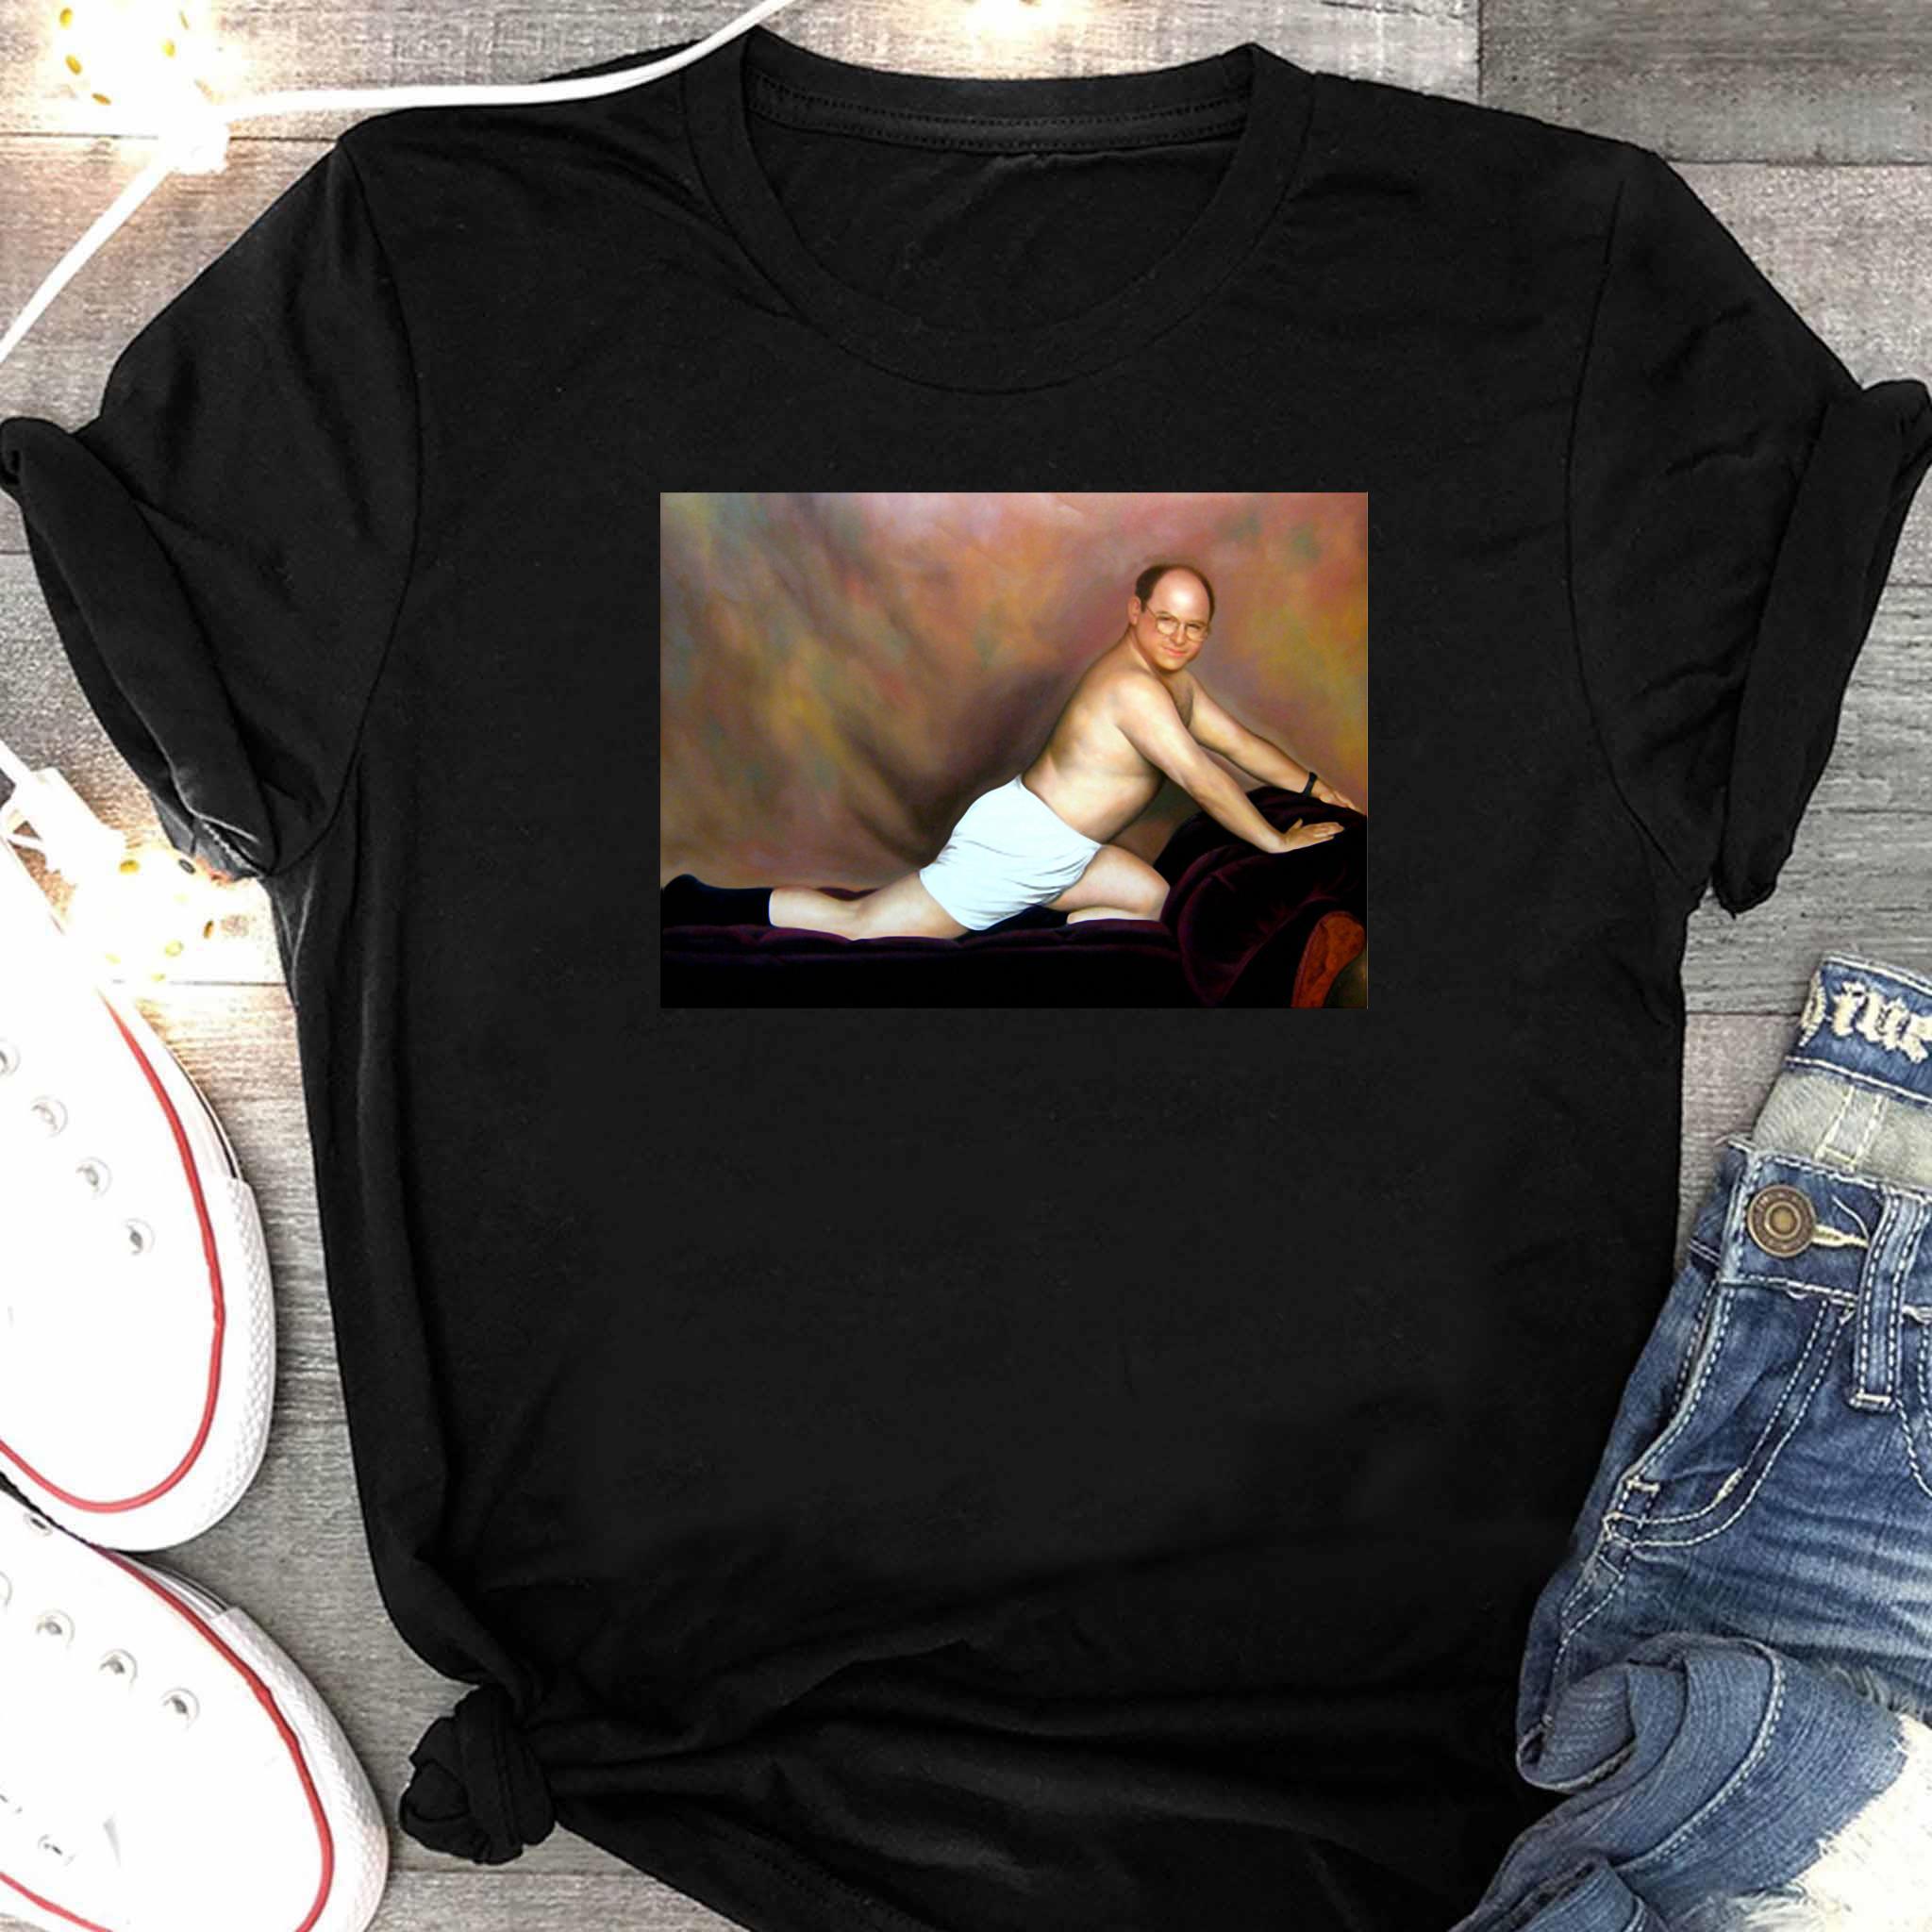 George Costanza Painting Shirt Women's Shirt